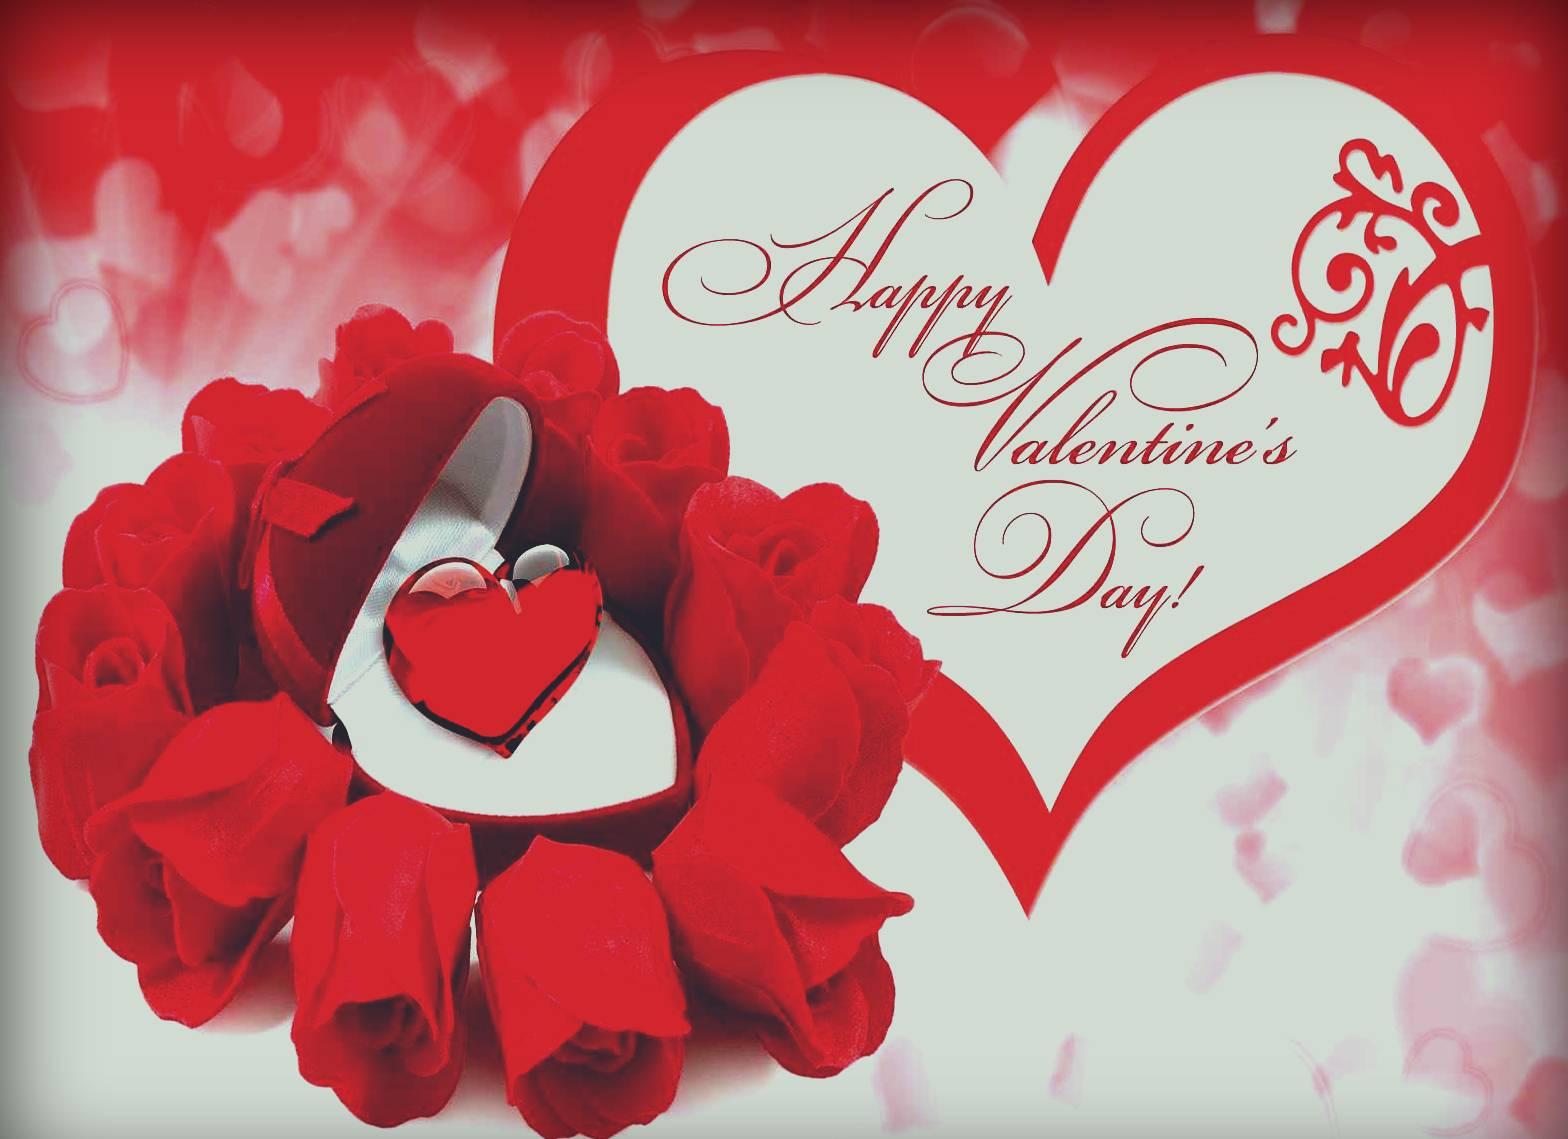 Happy Valentine's Day 2021 Wallpaper